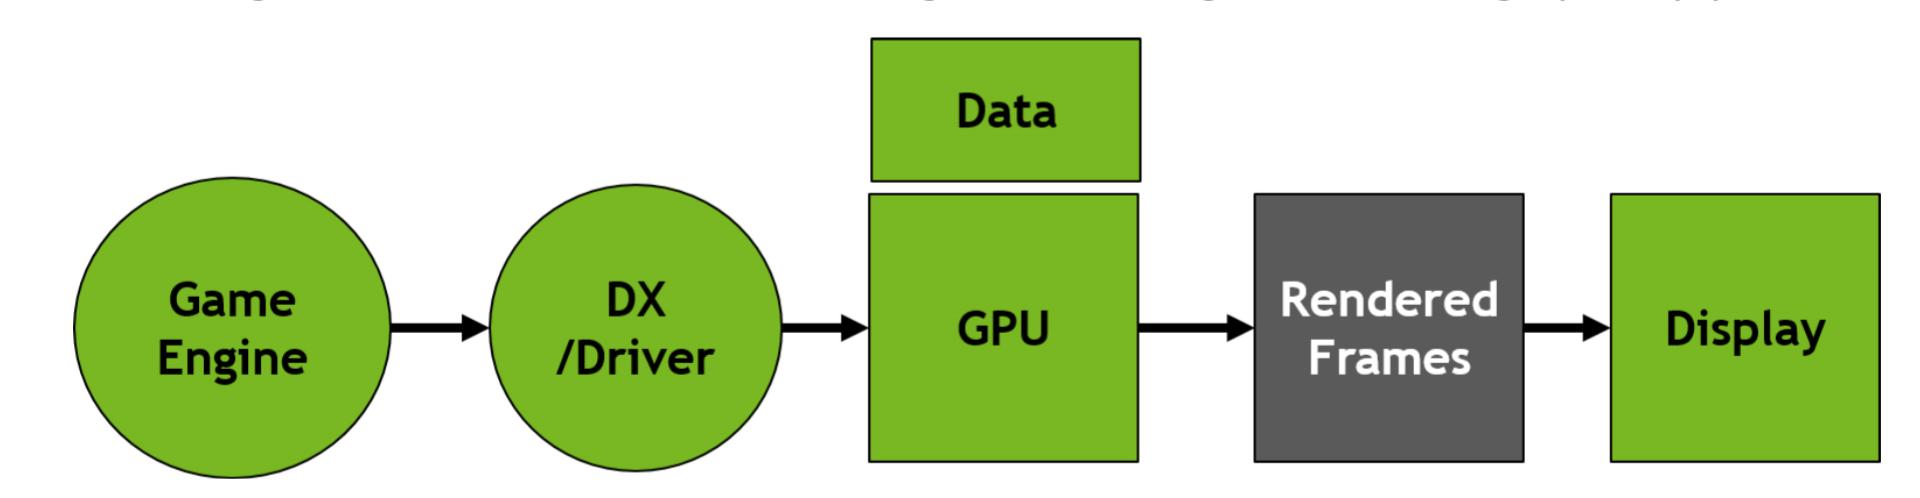 nvidia geforce gtx 1080 mit pascal architektur im xxl test hardwareluxx. Black Bedroom Furniture Sets. Home Design Ideas